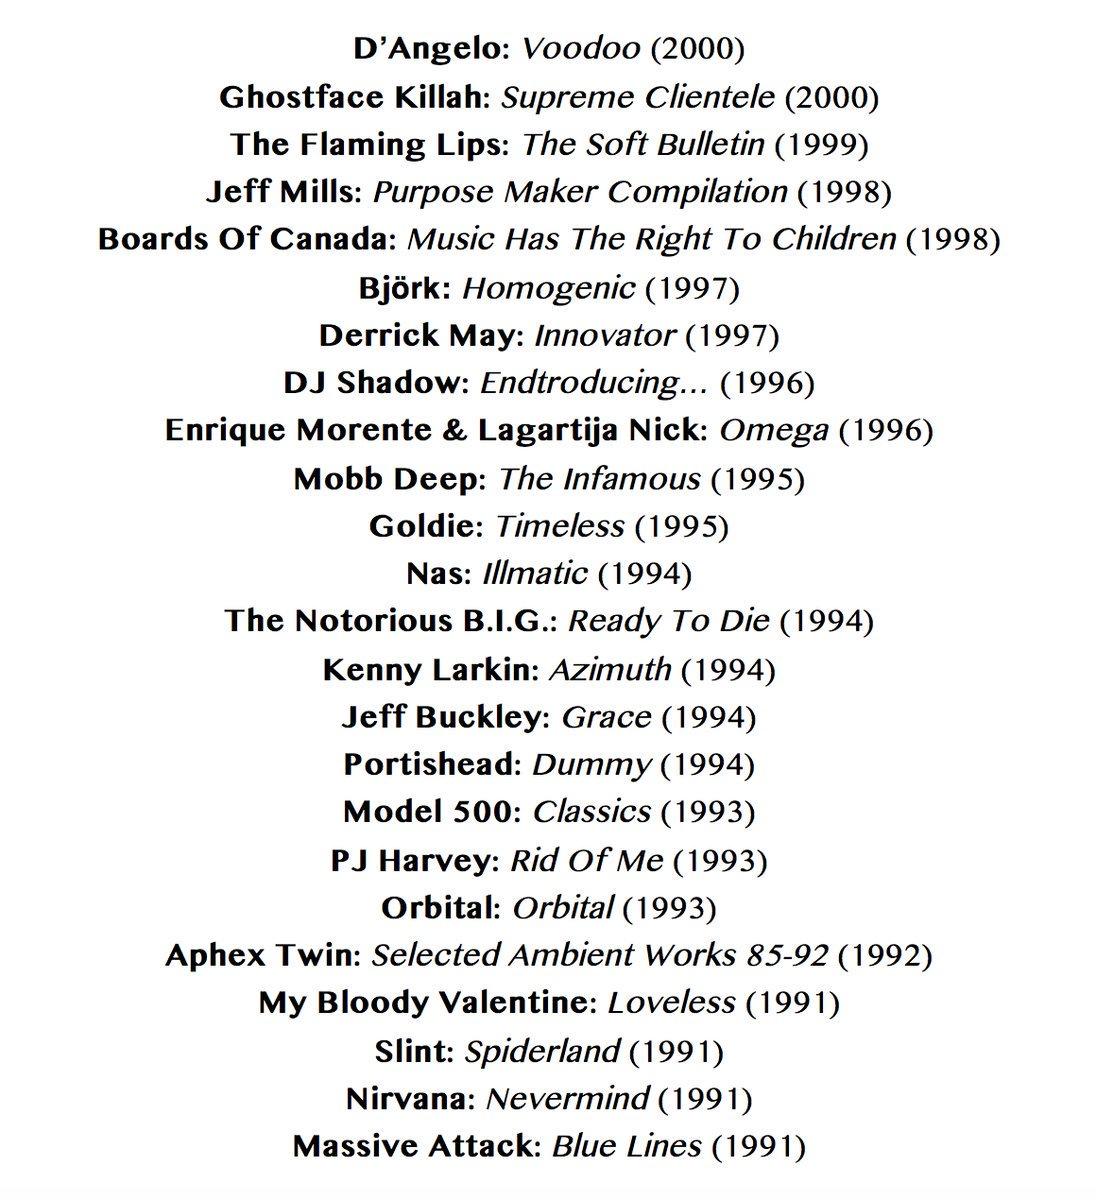 The basis of the musical 90s #Pop #Rock #Blues #Jazz #SoulMusic #HipHop #TripHop #HouseMusic #Techno #Music #History #Journalism #DataViz #BigData<br>http://pic.twitter.com/VvKDvk5Rfv